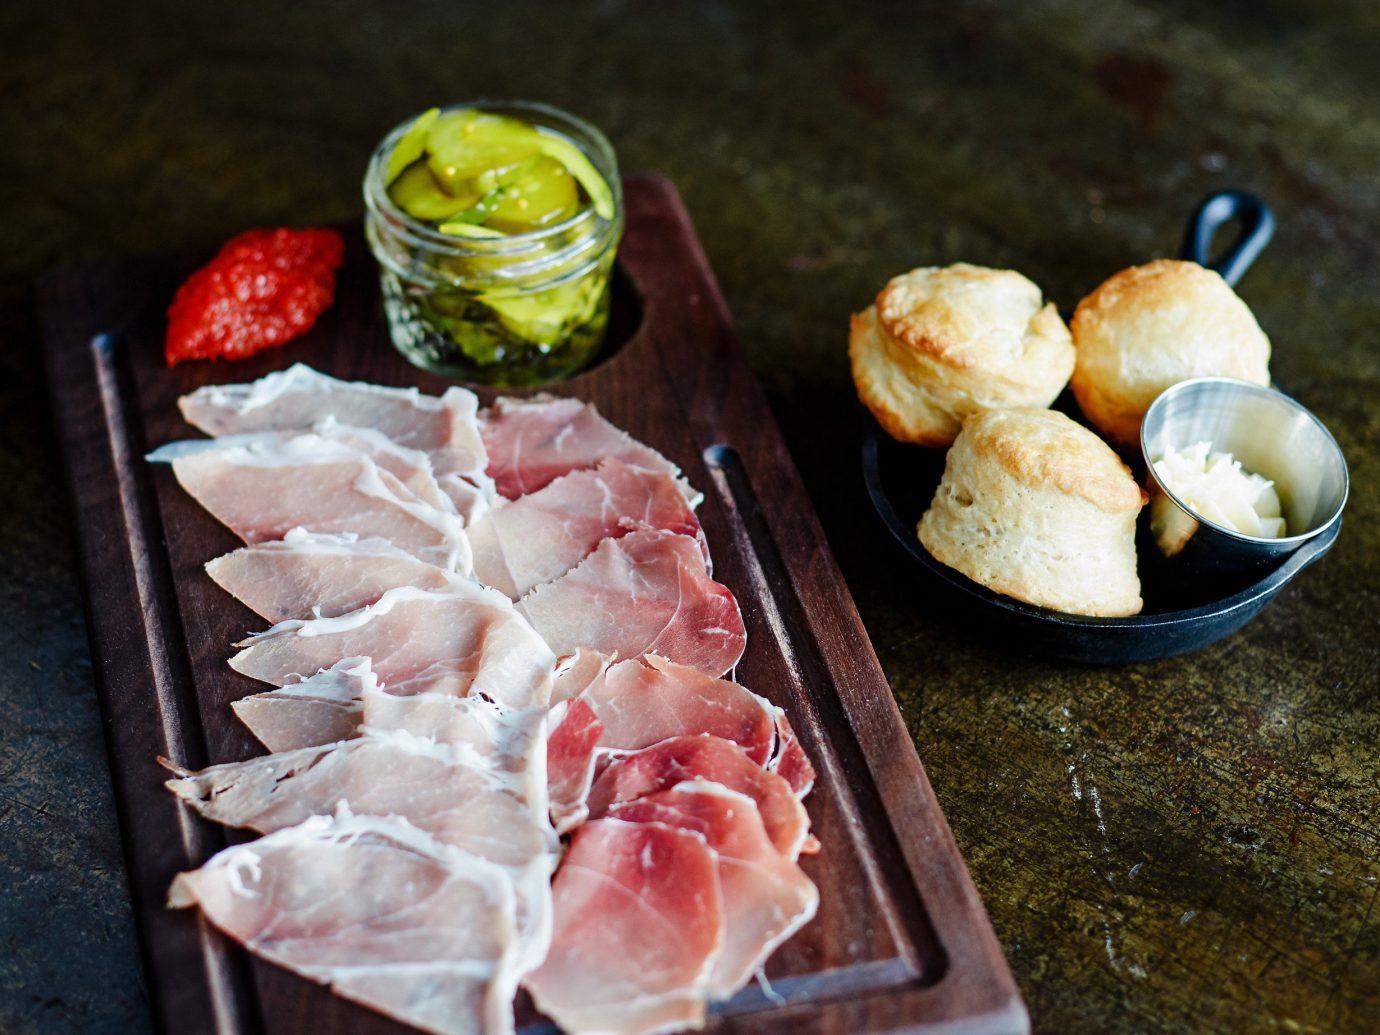 Romance Trip Ideas Weekend Getaways food dish meal meat produce fish cuisine sliced several